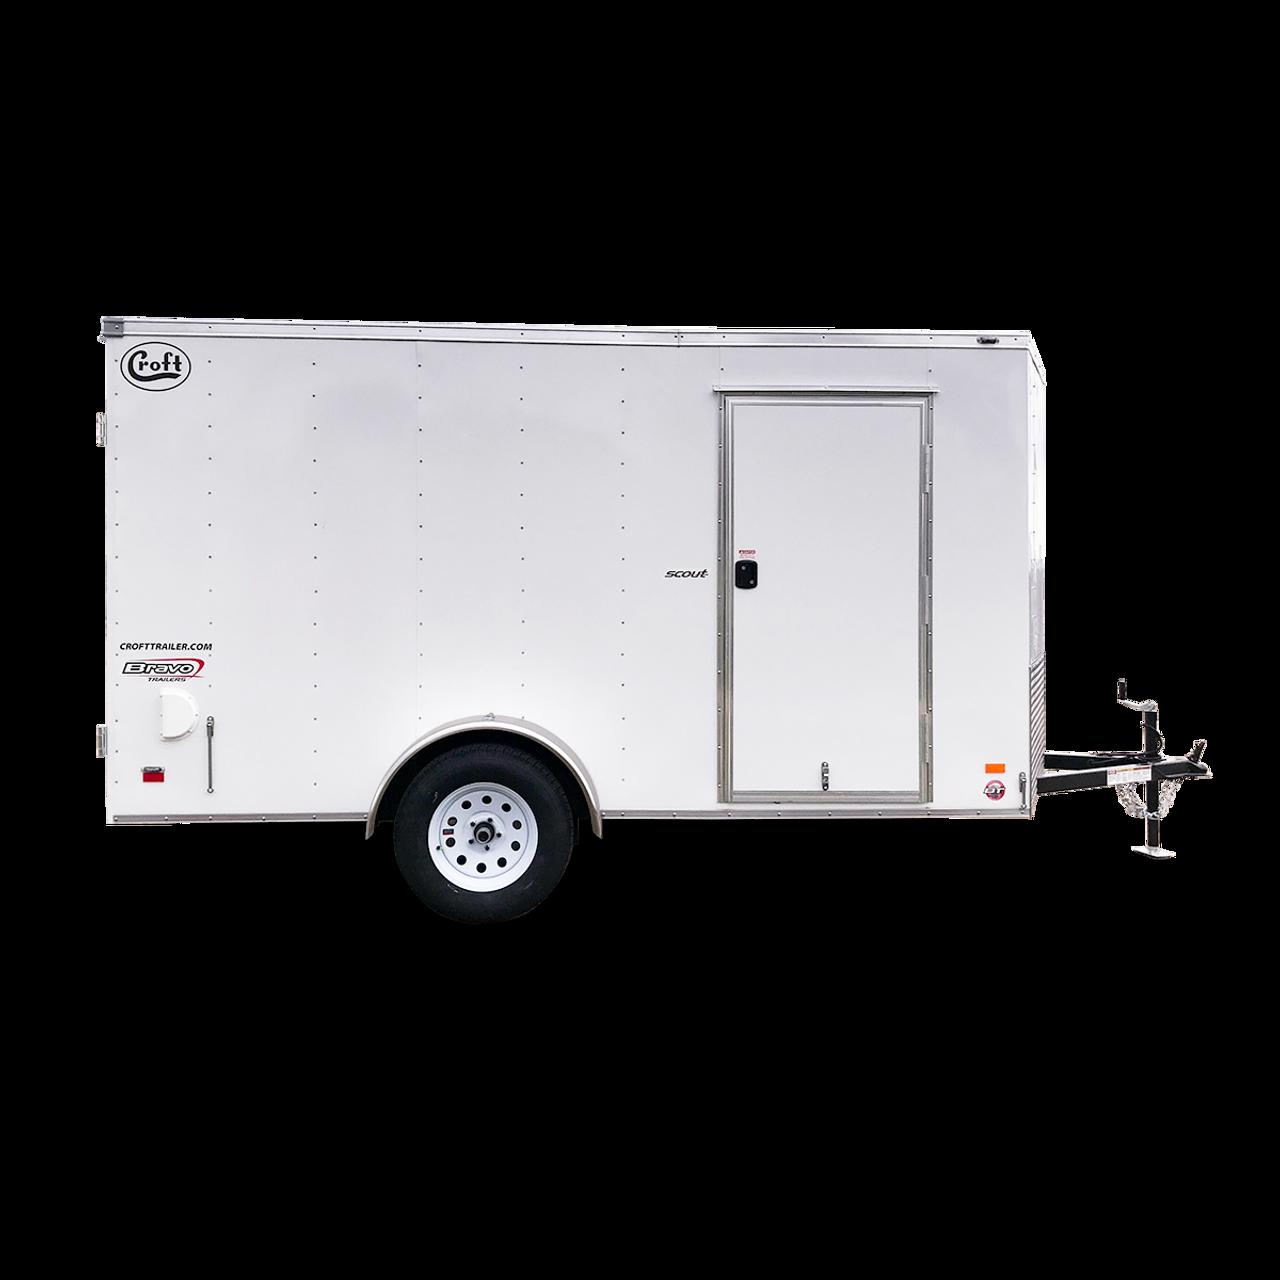 SC612SAD --- 6' X 12' Enclosed Trailer with Double Rear Doors - Bravo